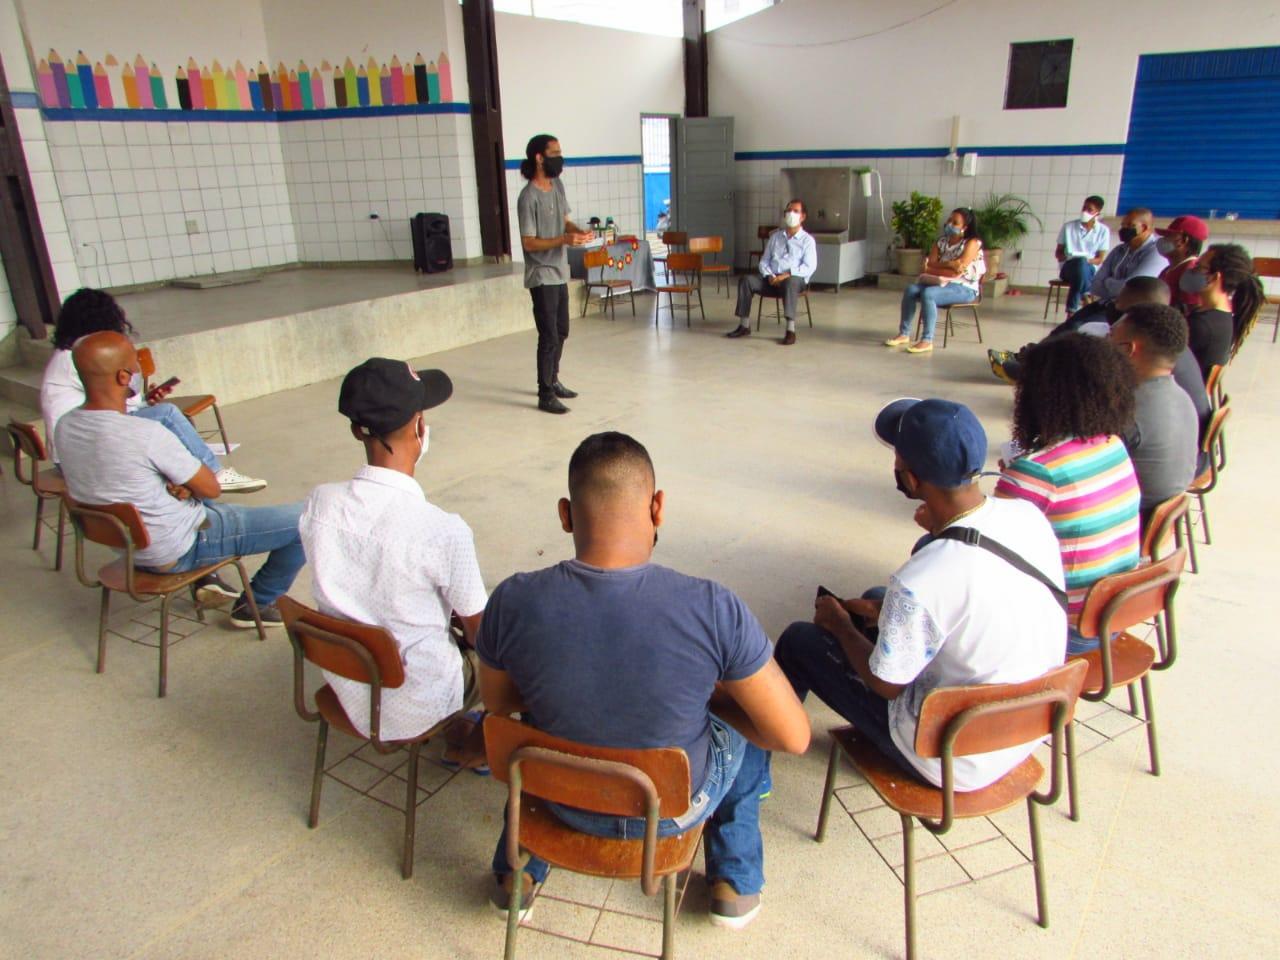 Prefeitura abre roda de conversa sobre álcool e drogas para jovens de Lauro de Freitas